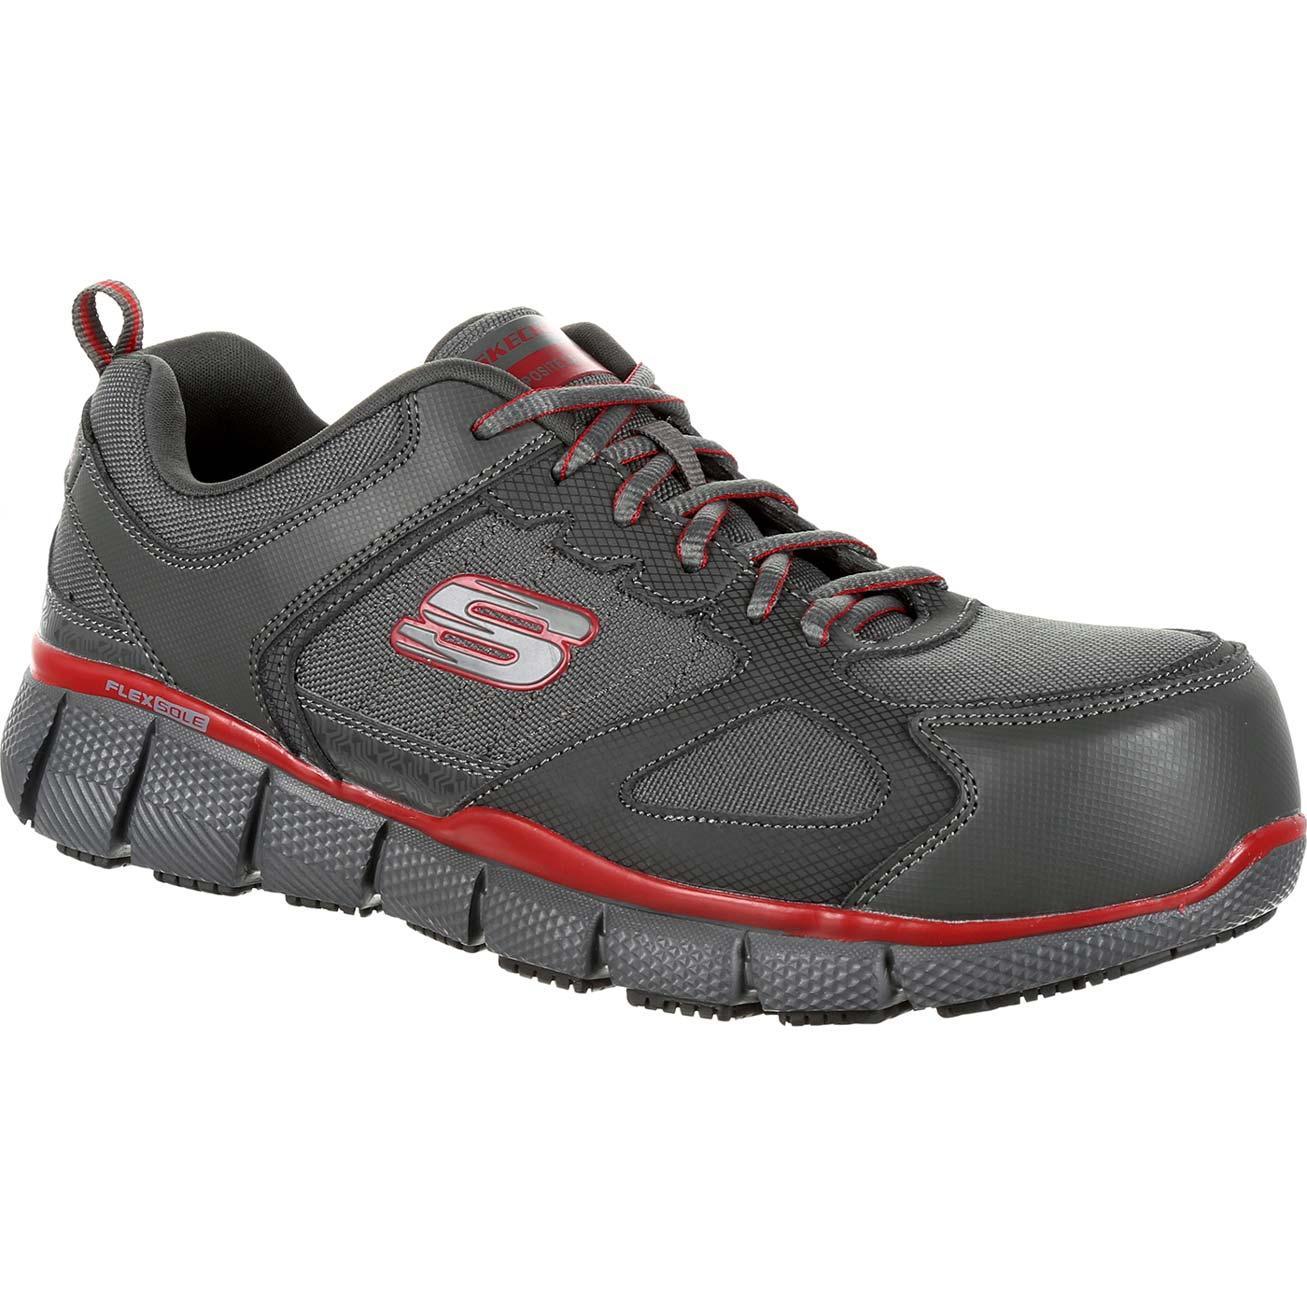 2236dd59959 SKECHERS Telfin Composite Toe Puncture-Resistant Slip-Resistant Work  Athletic ShoeSKECHERS Telfin Composite Toe Puncture-Resistant Slip-Resistant  Work ...